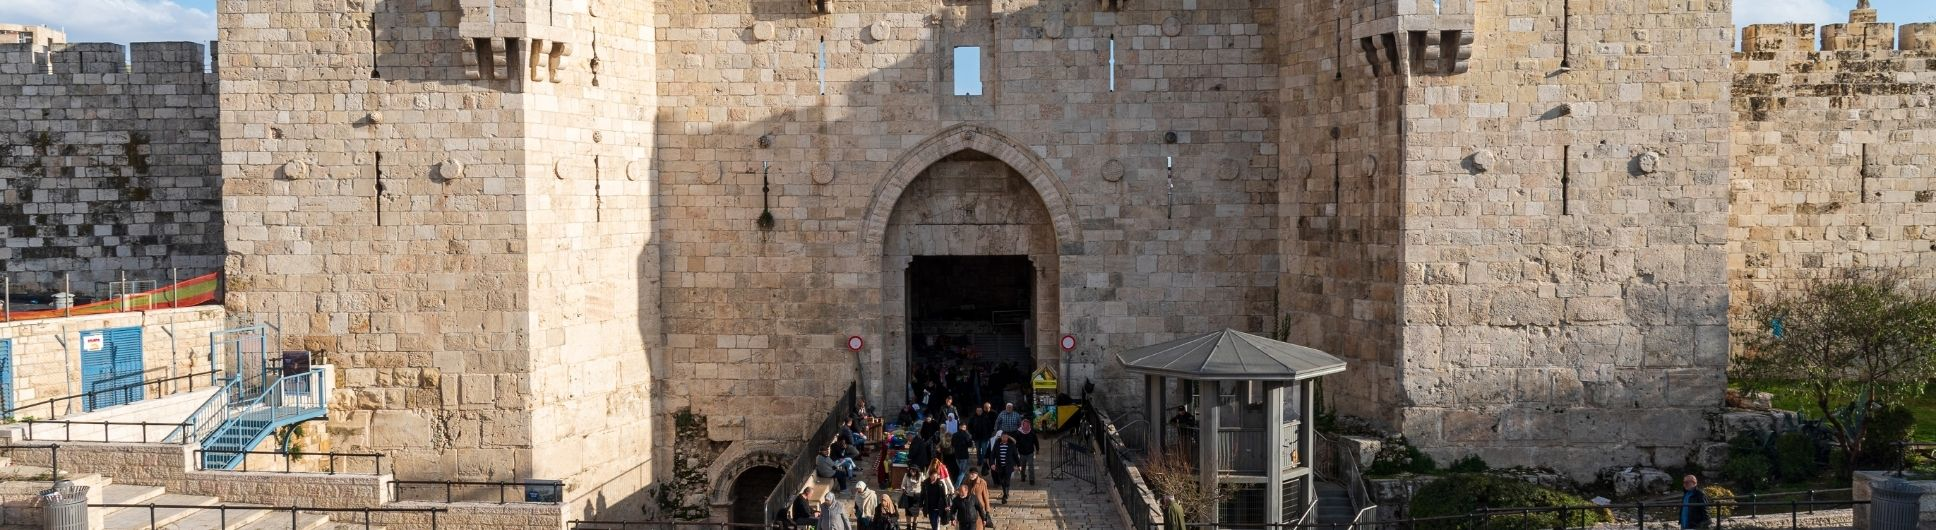 ICEJ_Damascus_Gate